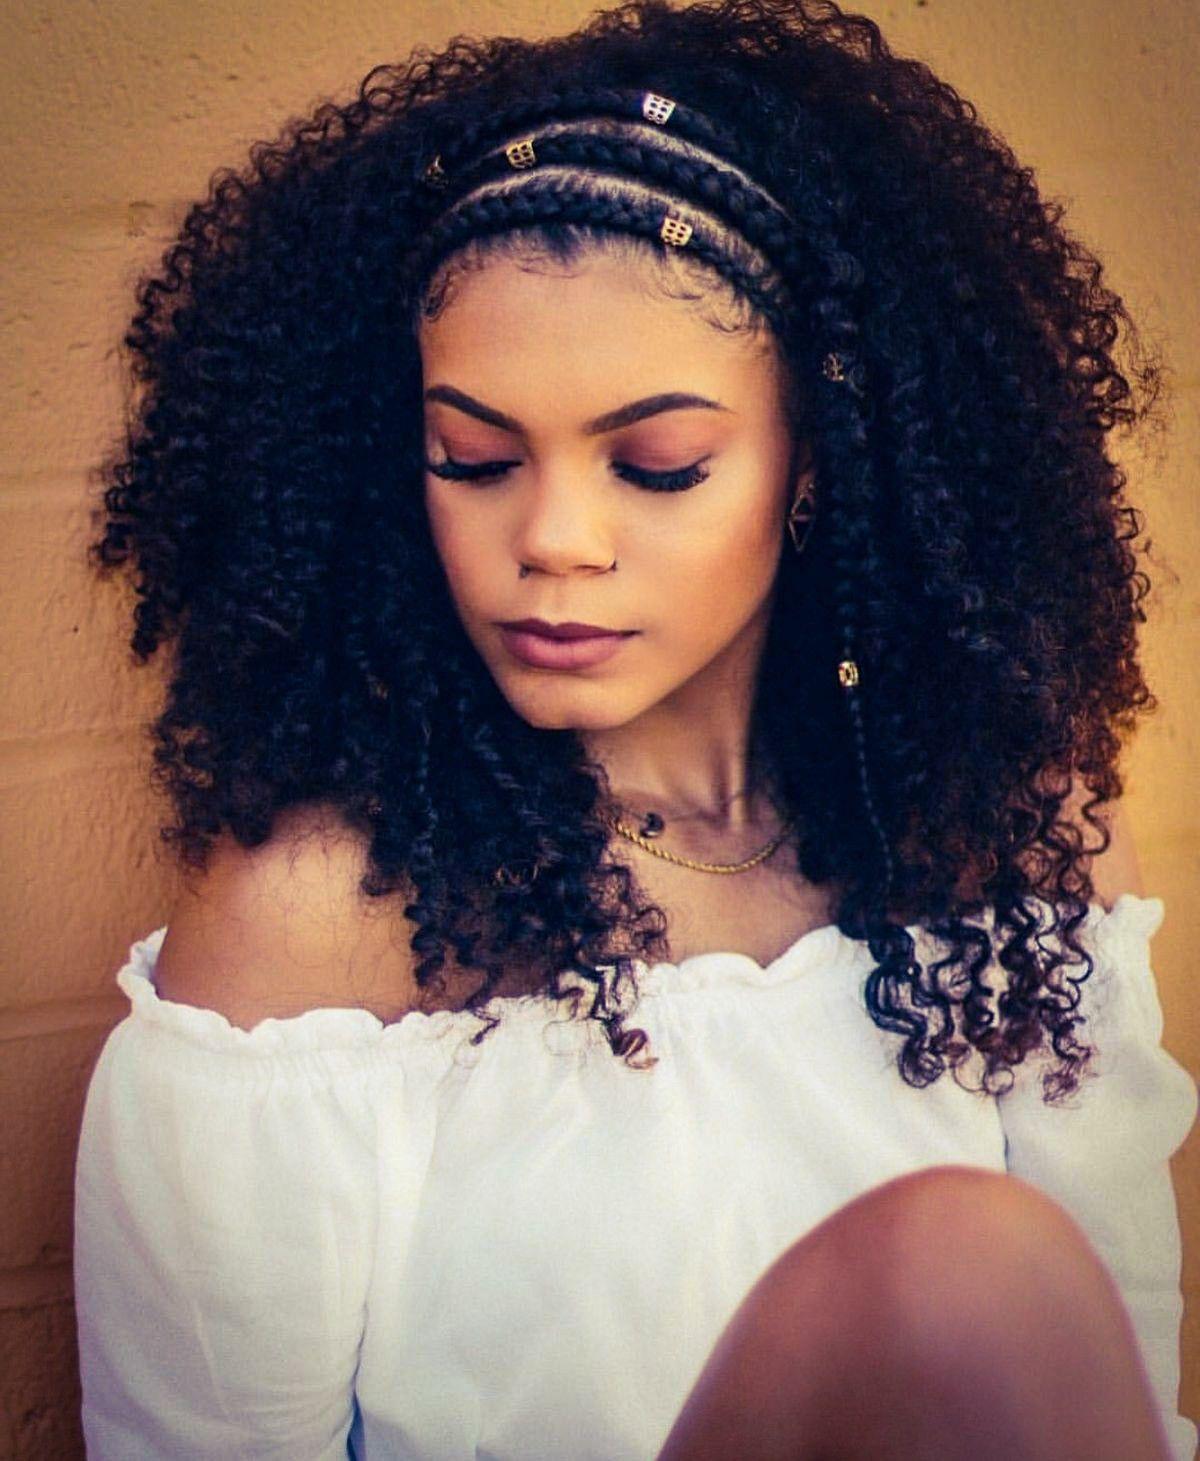 Ghana Braids Hair Style hairstyleforblackwomen.net 51